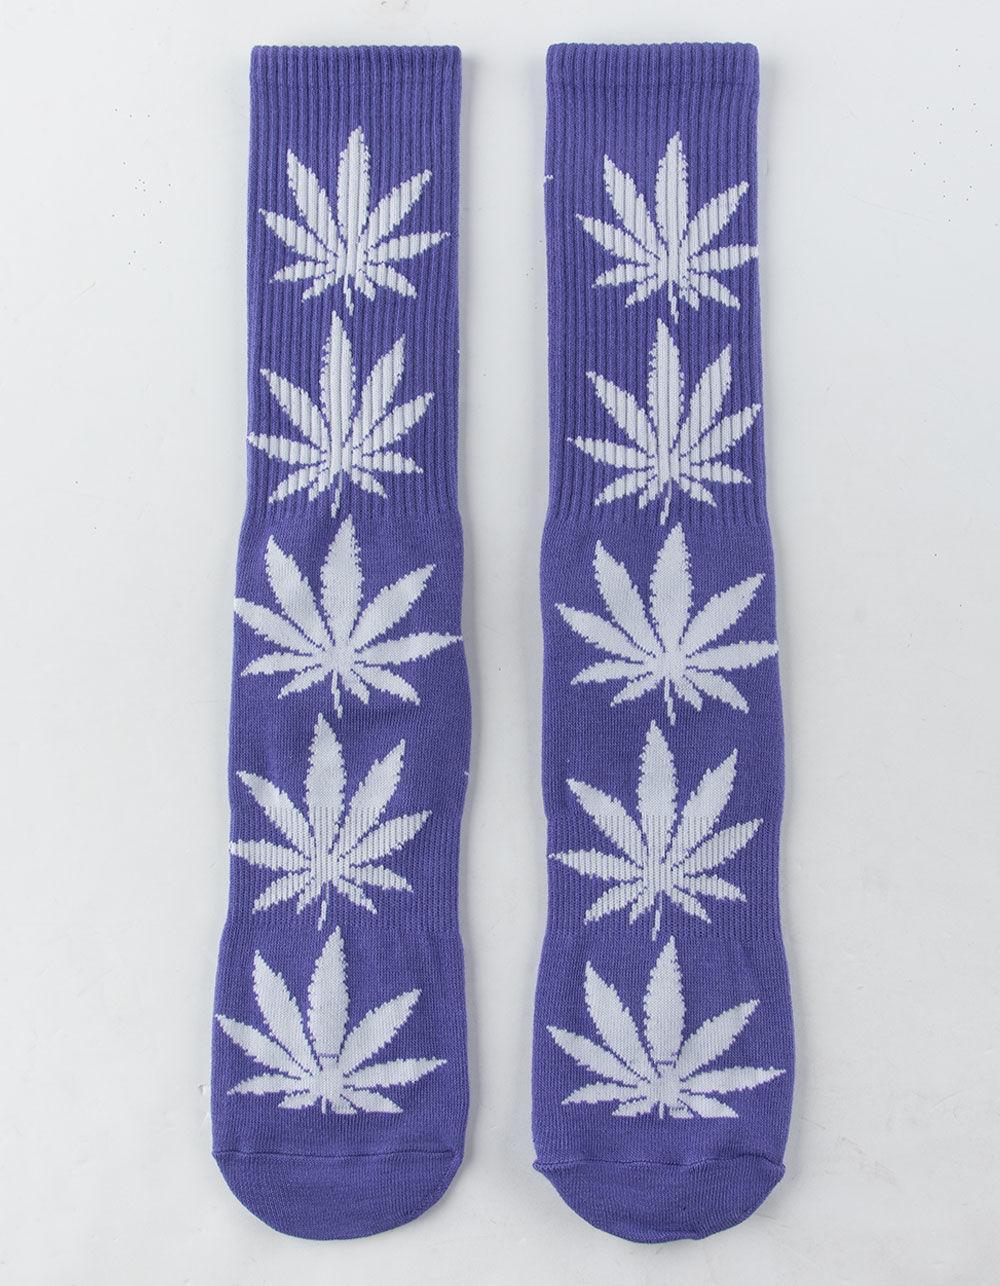 42767bdce17 Lyst - Huf Plantlife Purple Mens Crew Socks in Purple for Men